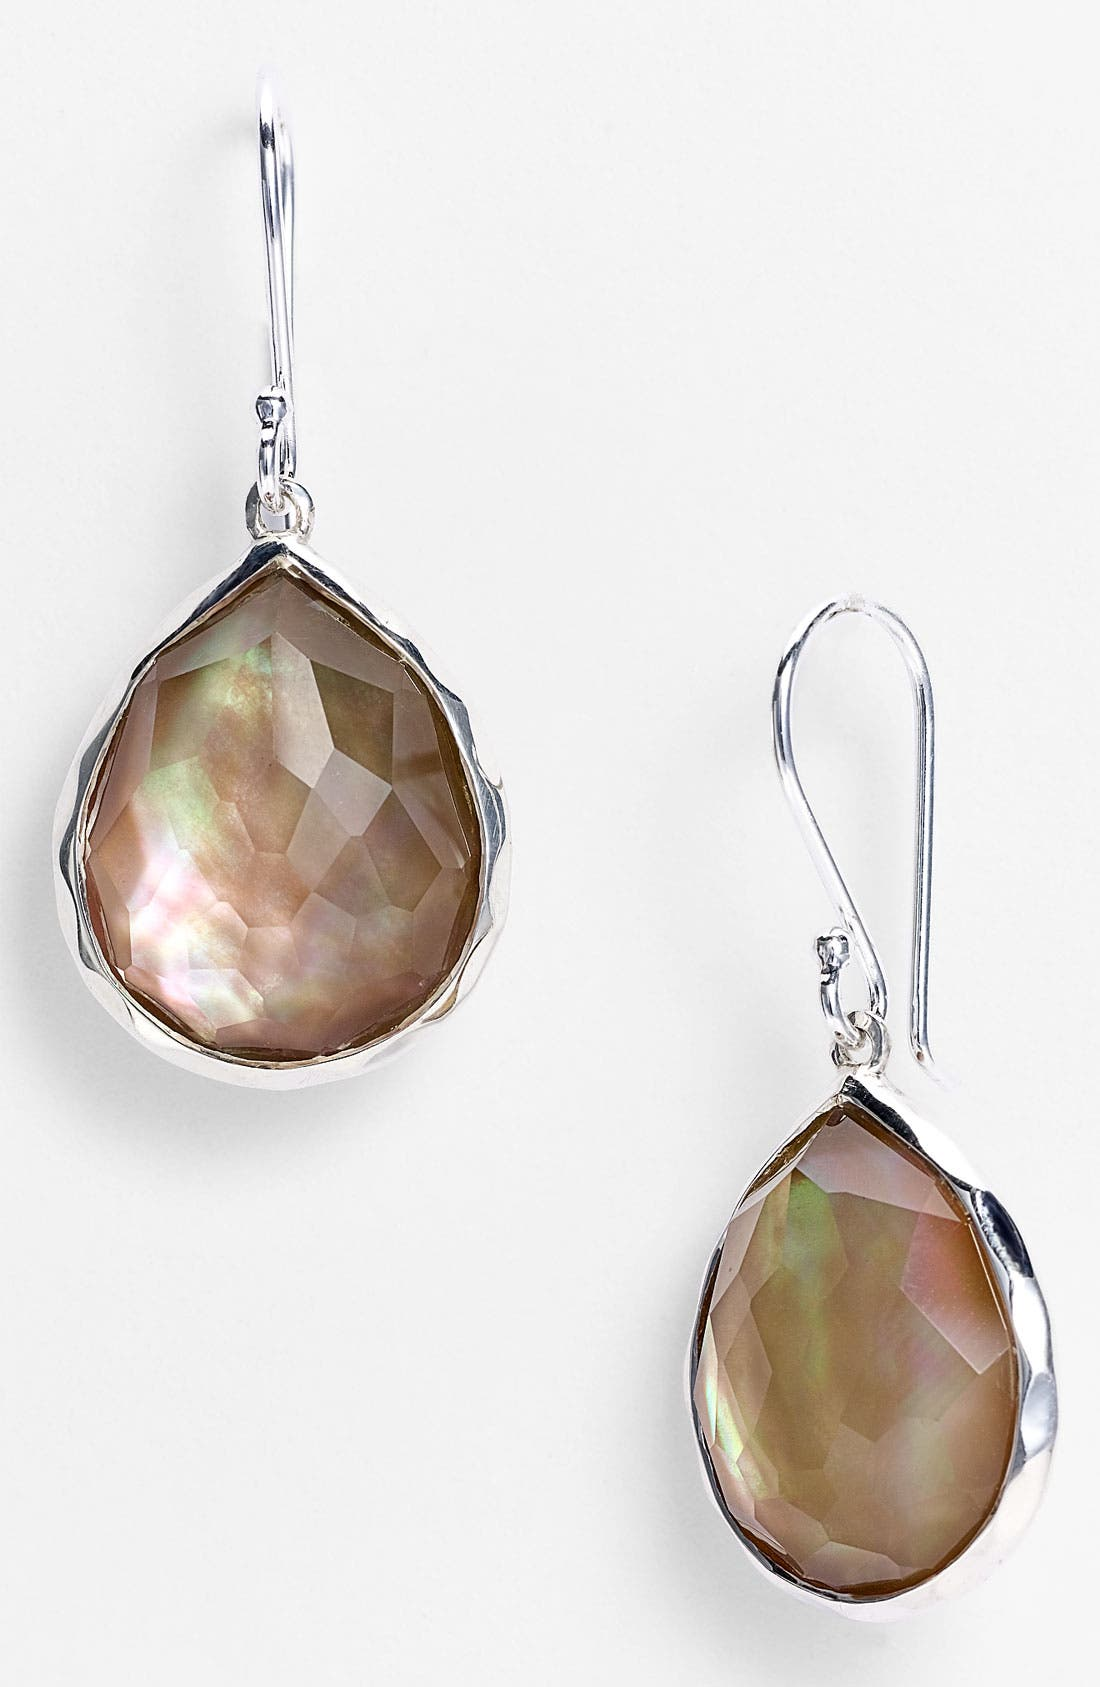 Alternate Image 1 Selected - Ippolita 'Candy Wonderland' Small Teardrop Earrings